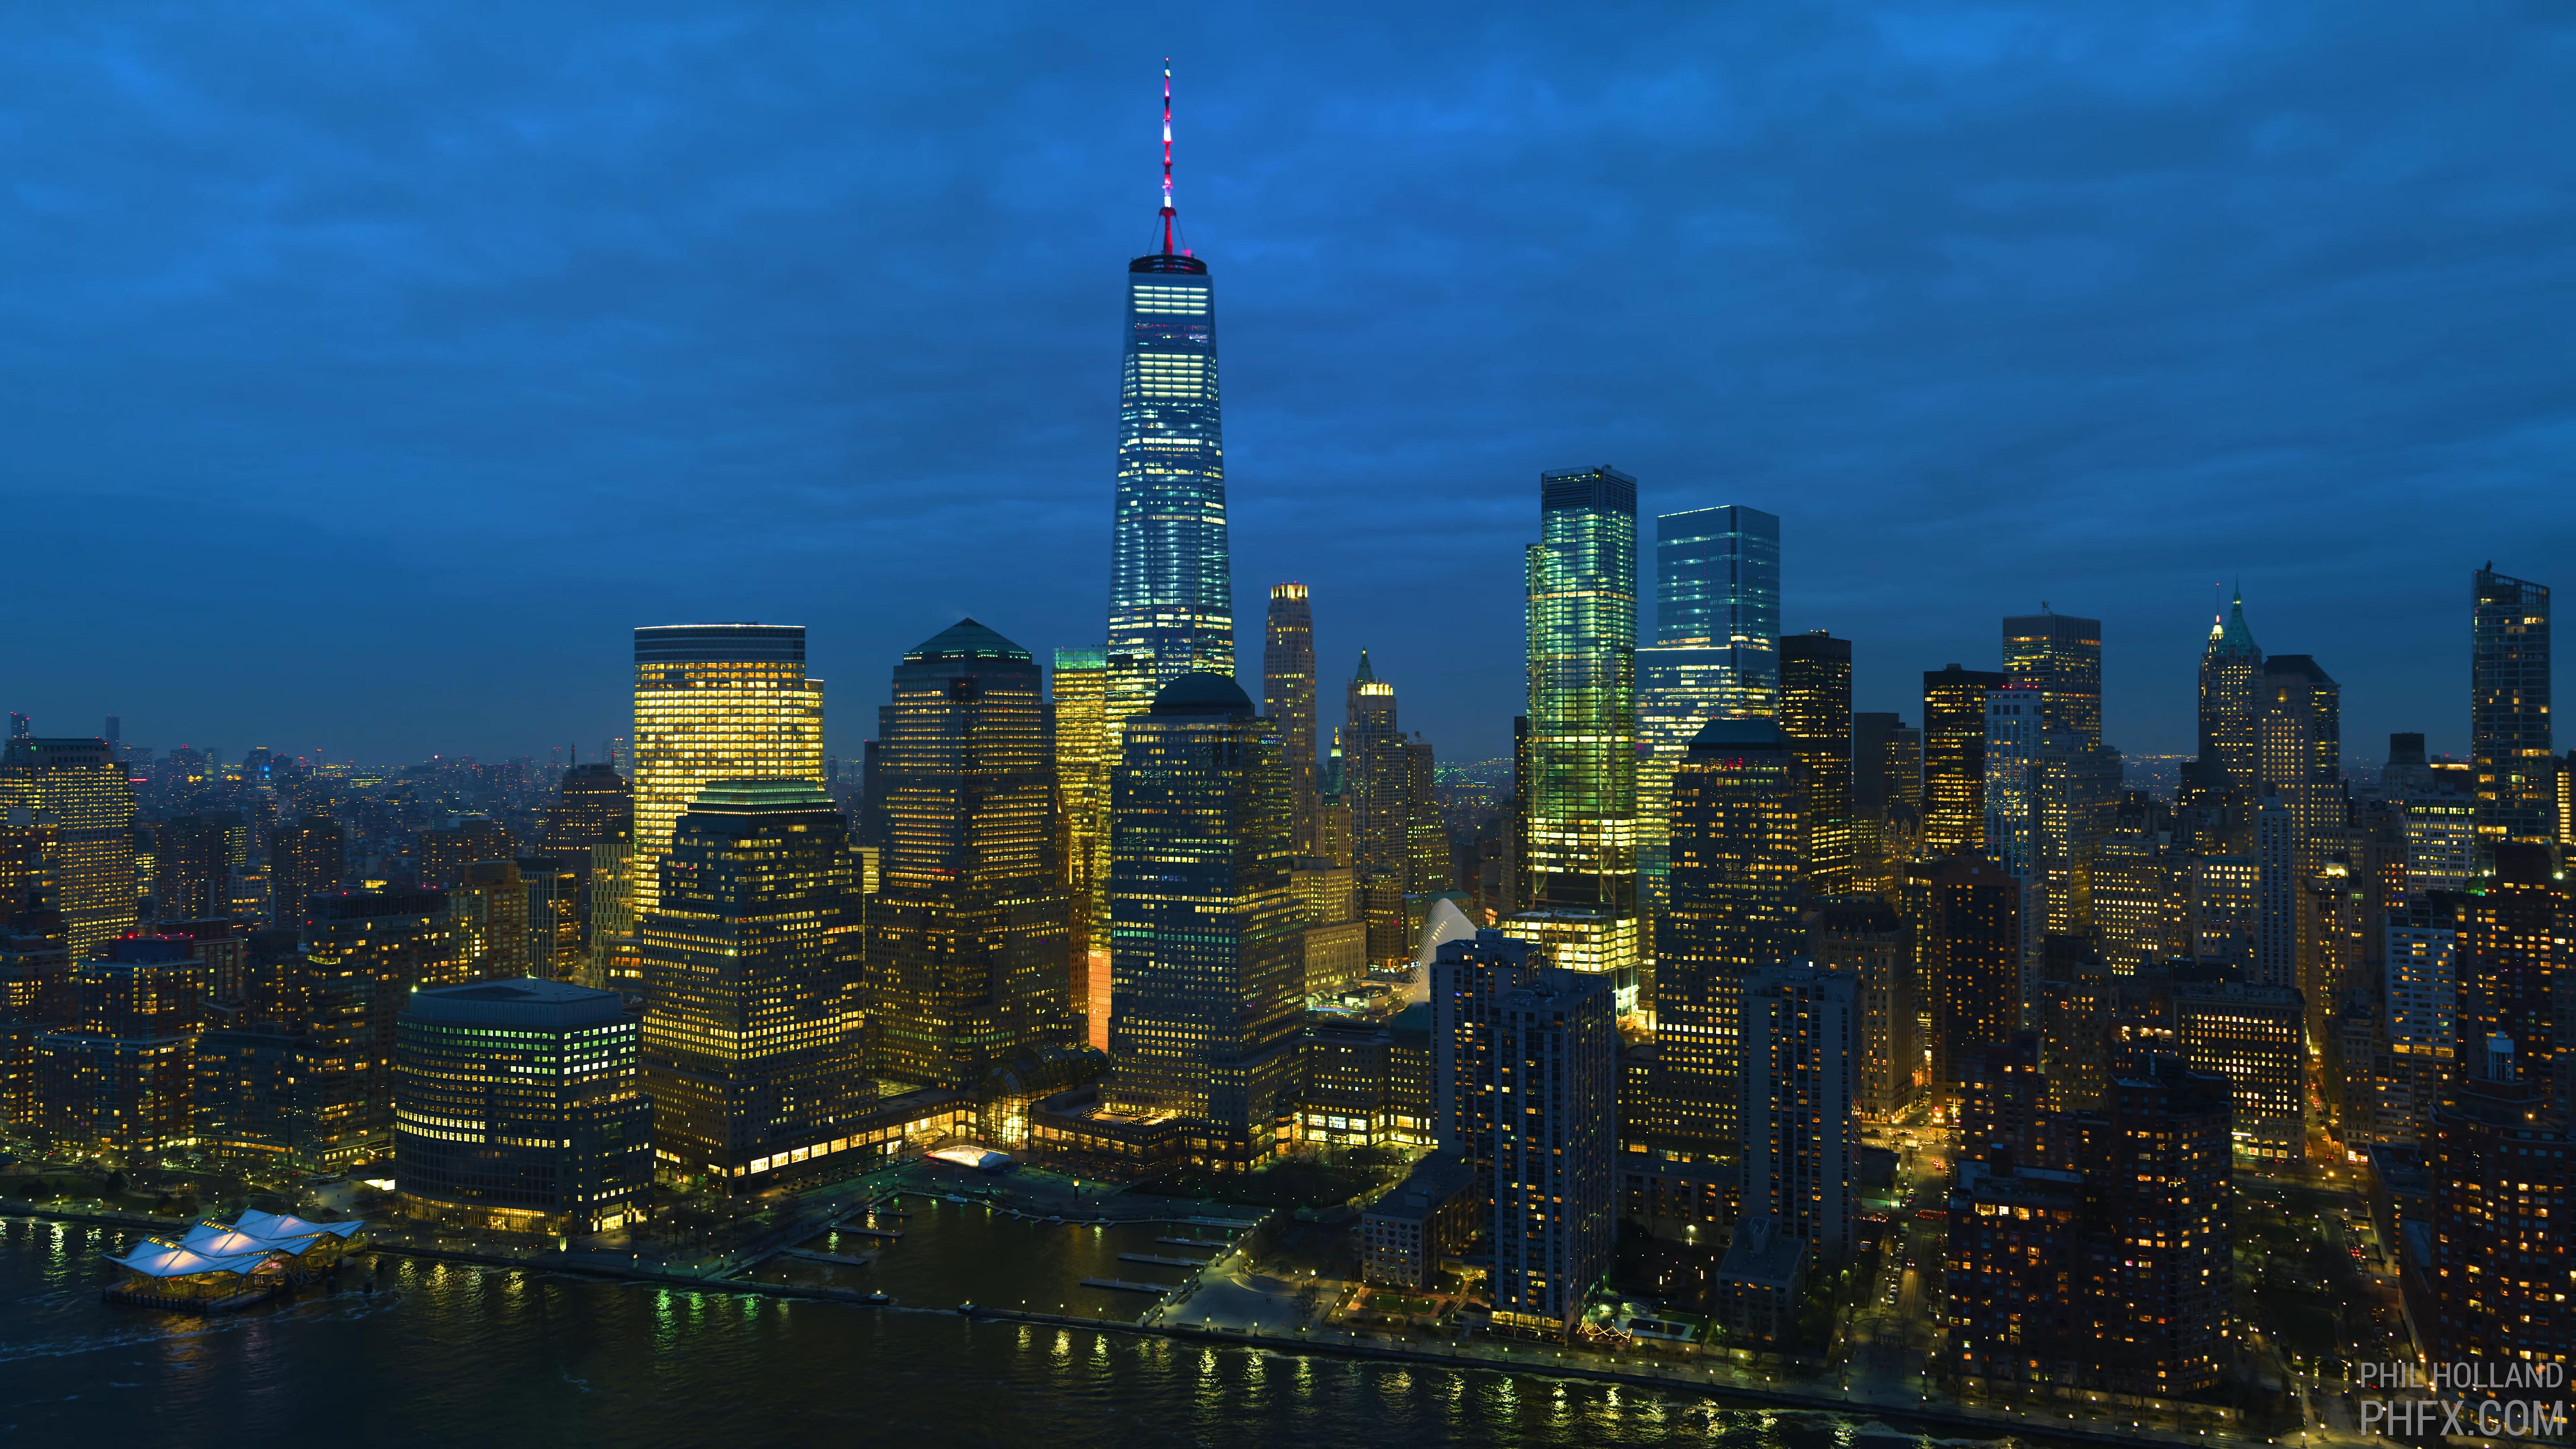 General 7680x4320 New York City lights sea building sky skyscape skyscraper